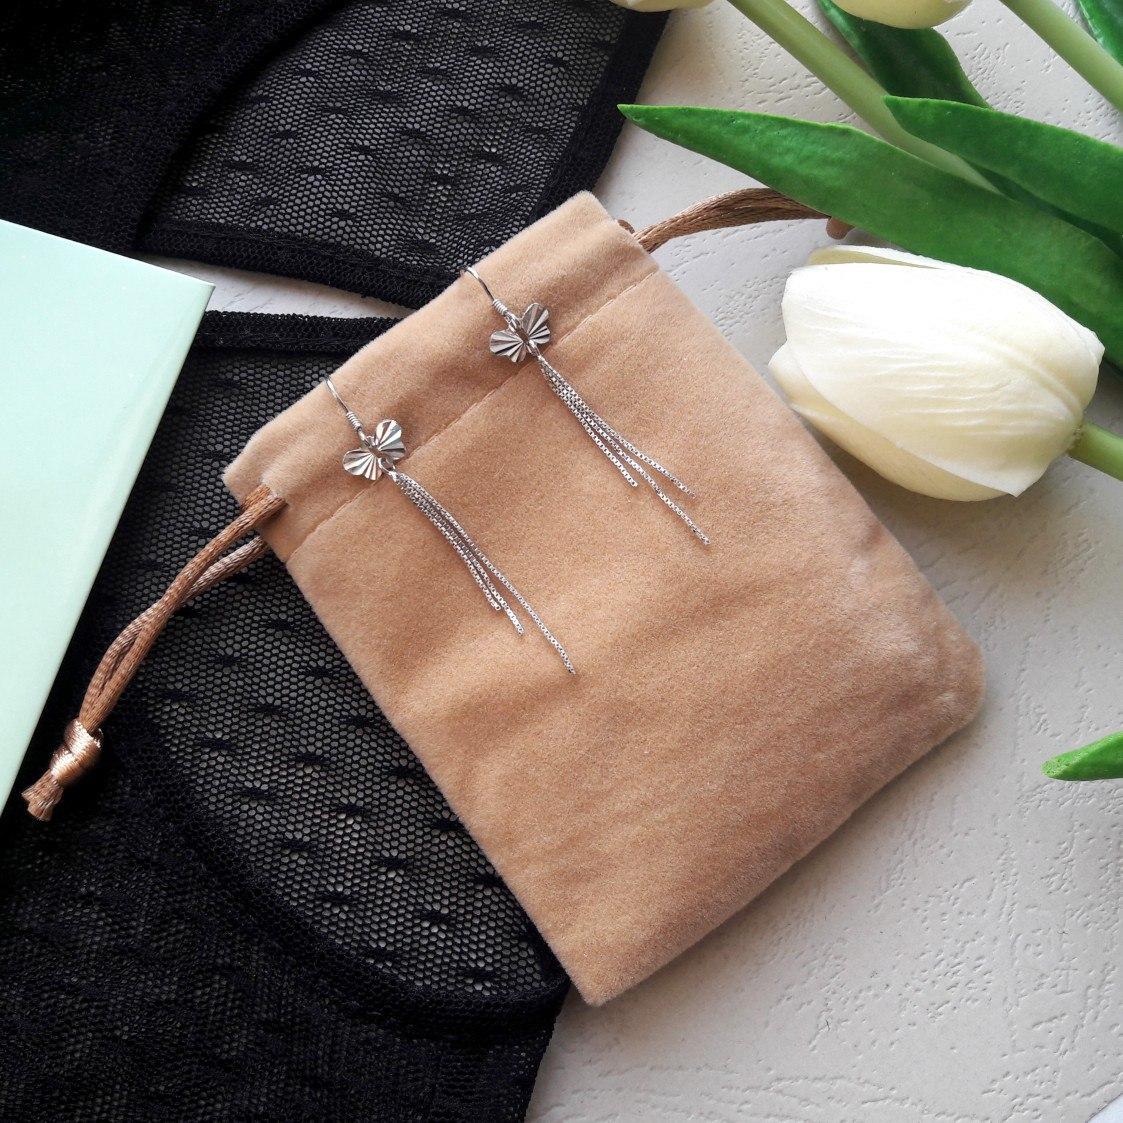 Серебряные серьги-бабочки из магазина Rinntin S925 Silver Jewels Store